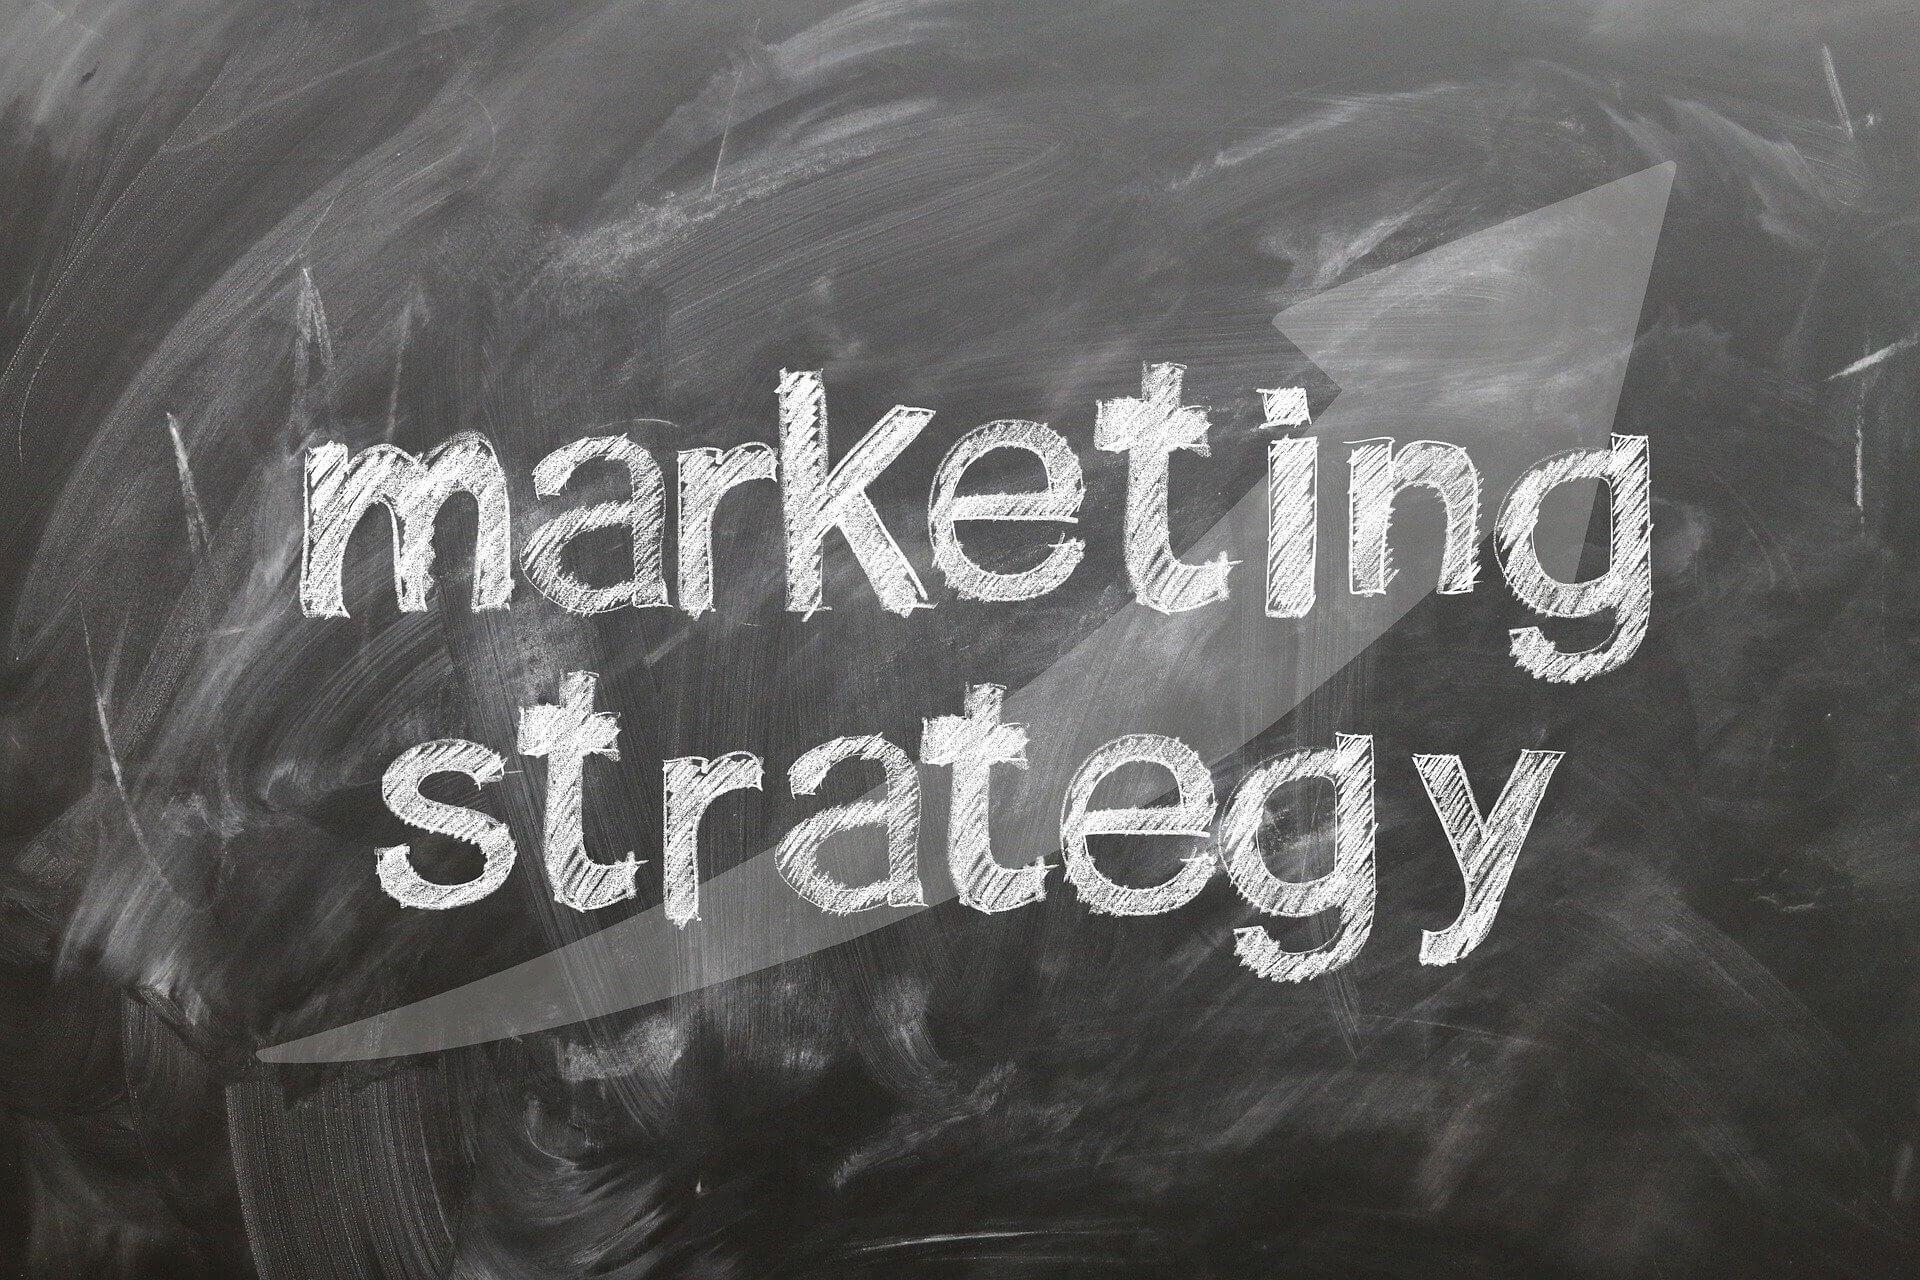 marketing-strategies-3105875_1920_1